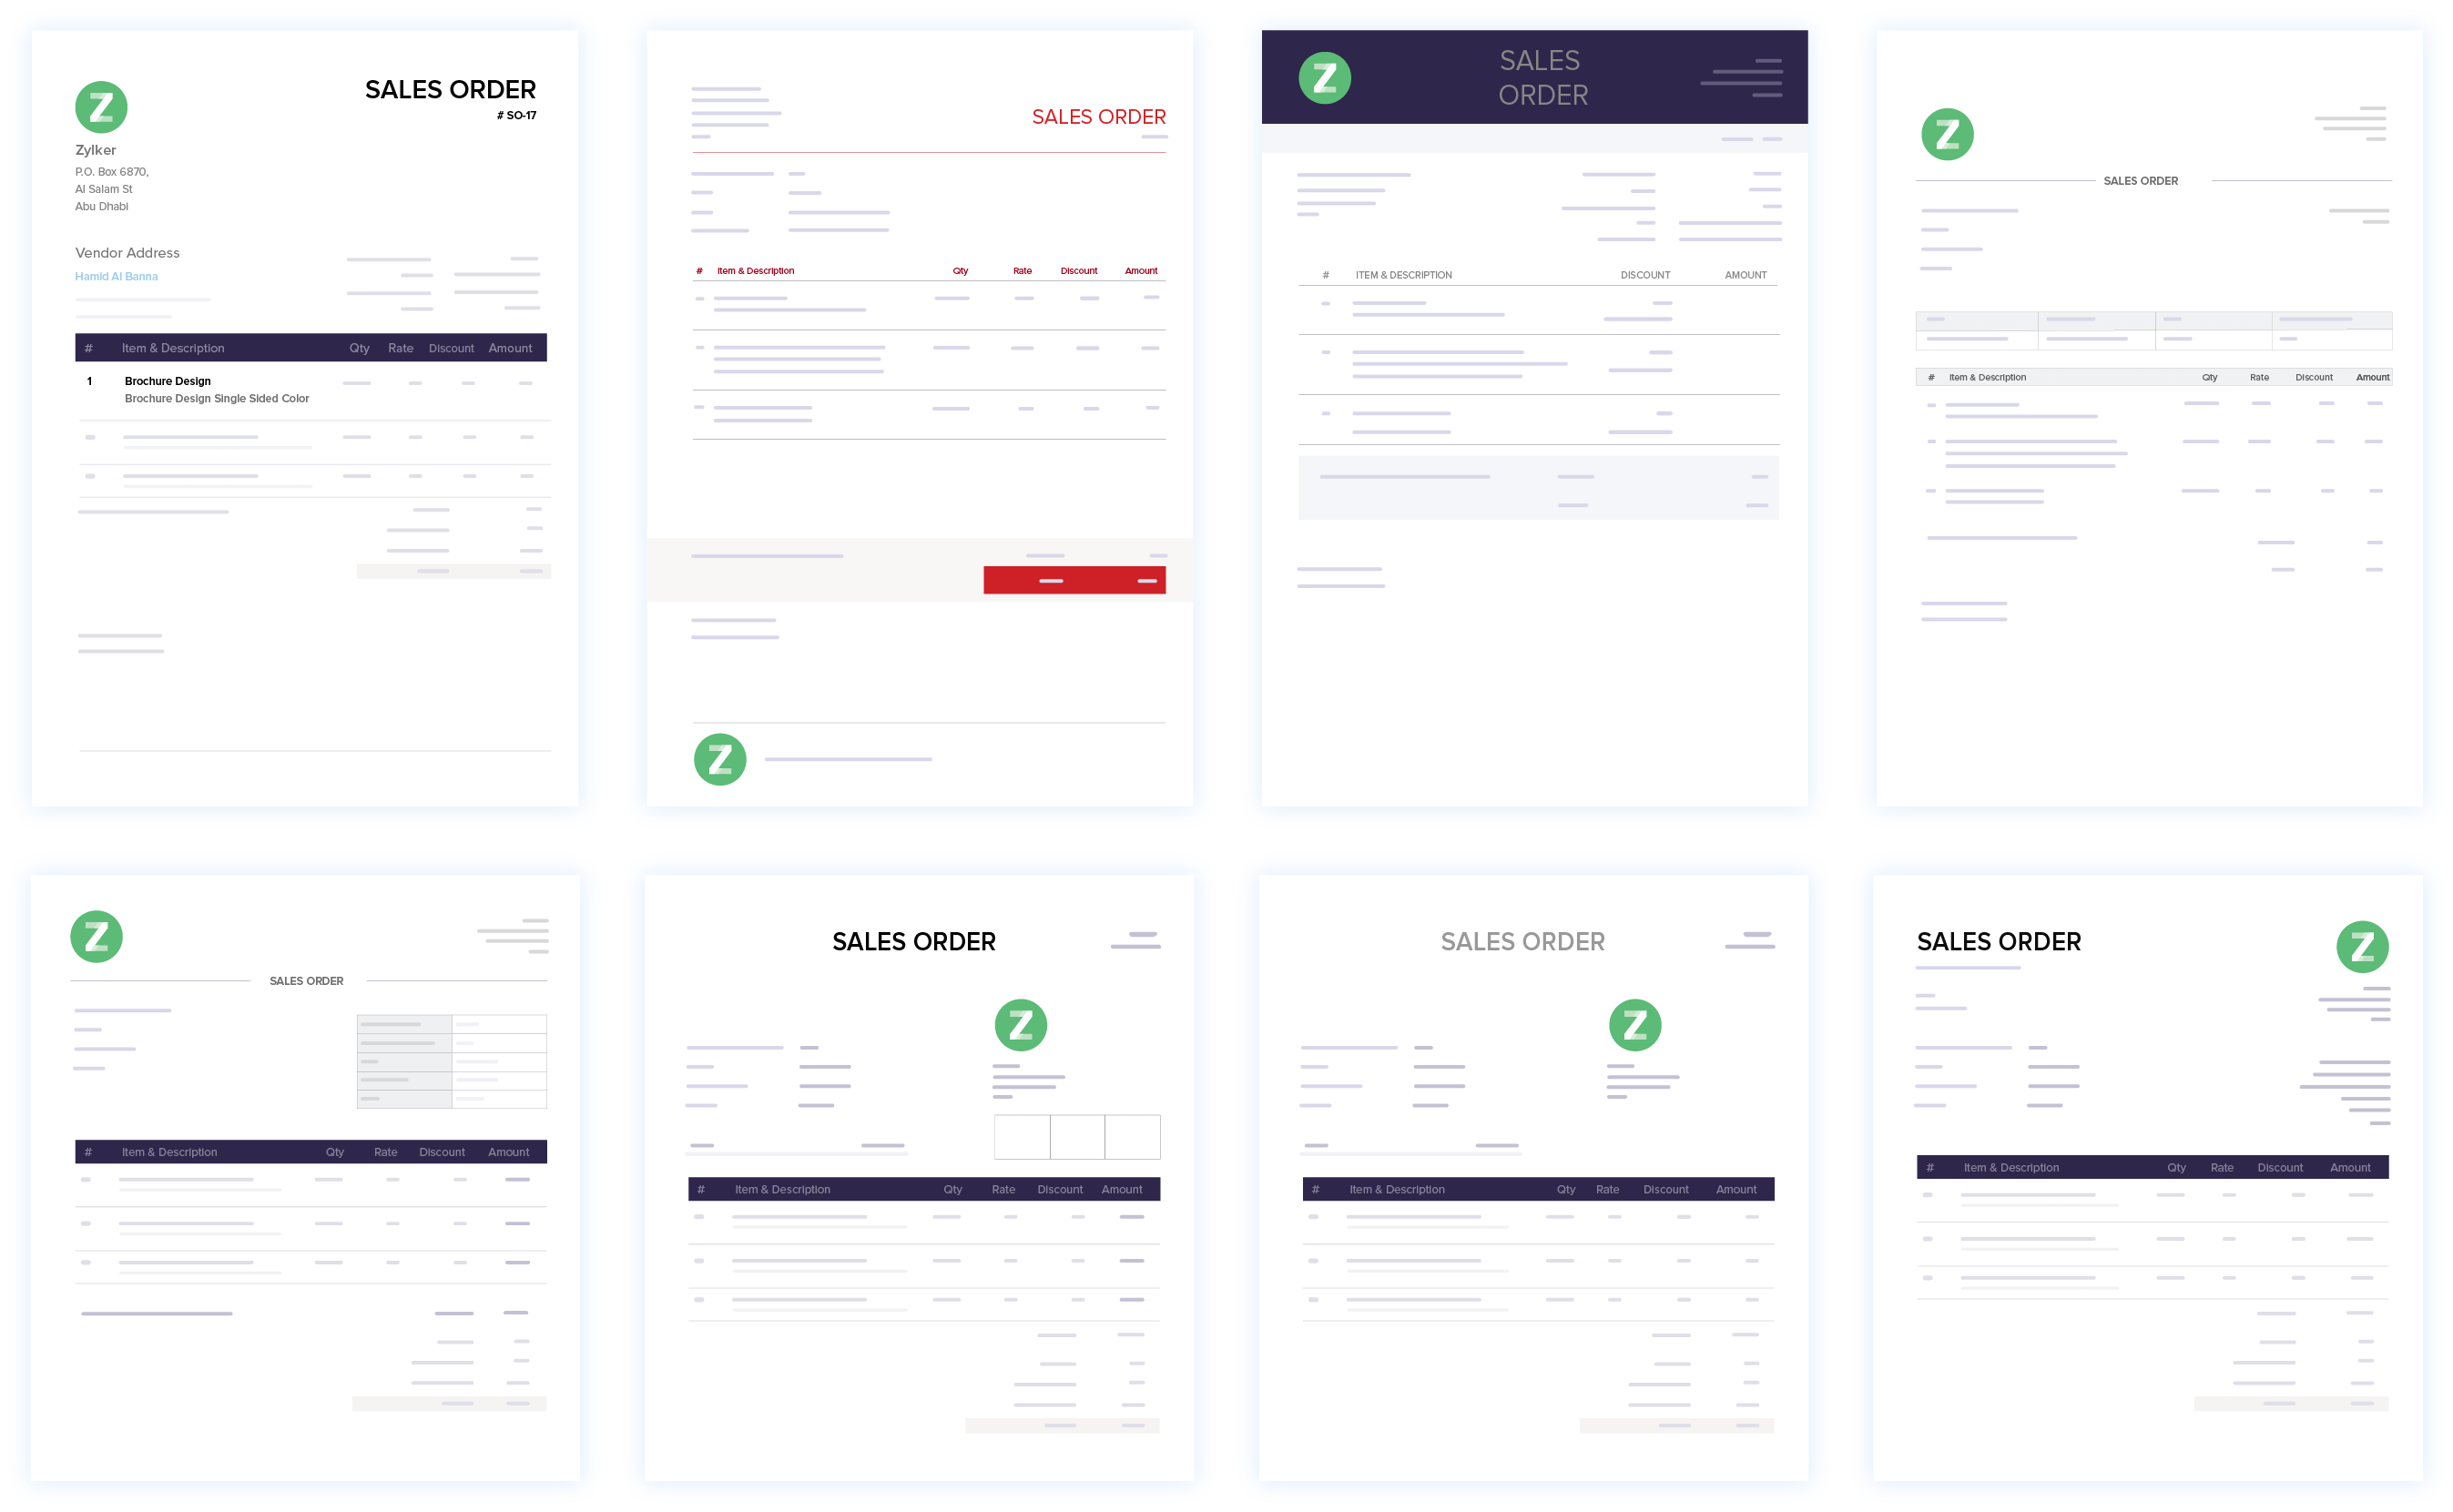 Sales Order Customization - Online Sales Order System   Zoho Books